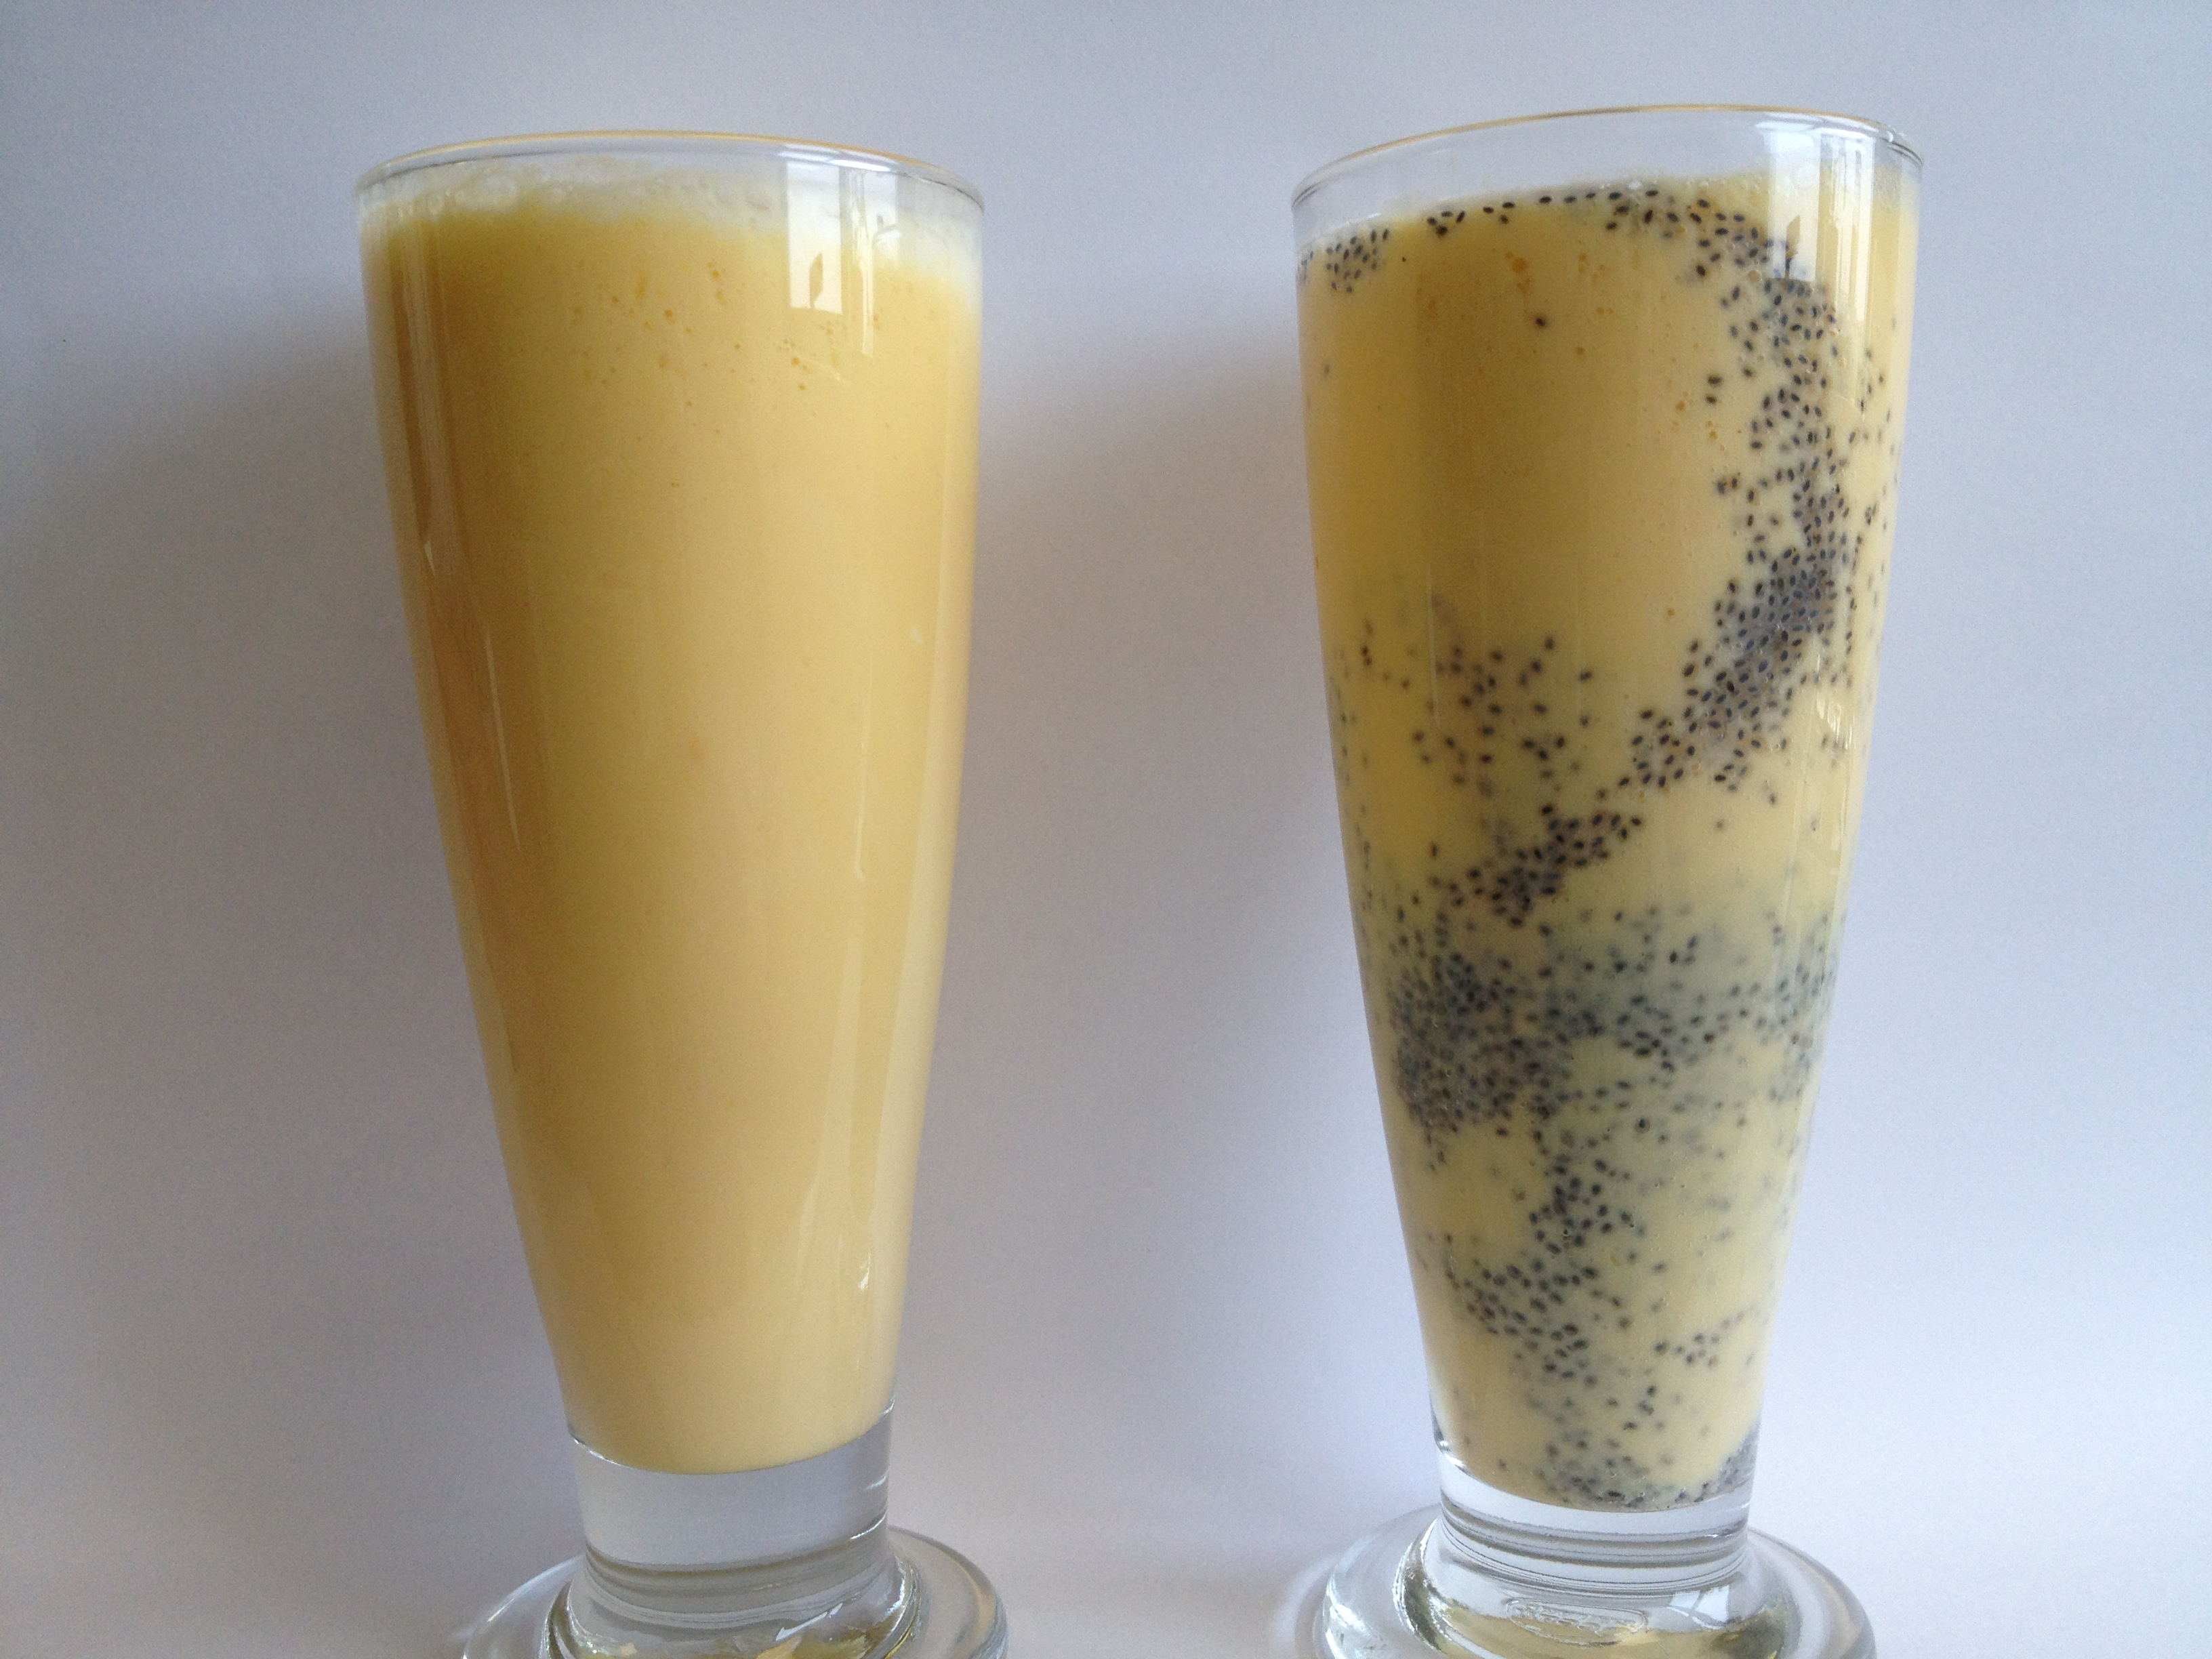 Mango Lassi (Mango Yogurt Drink)